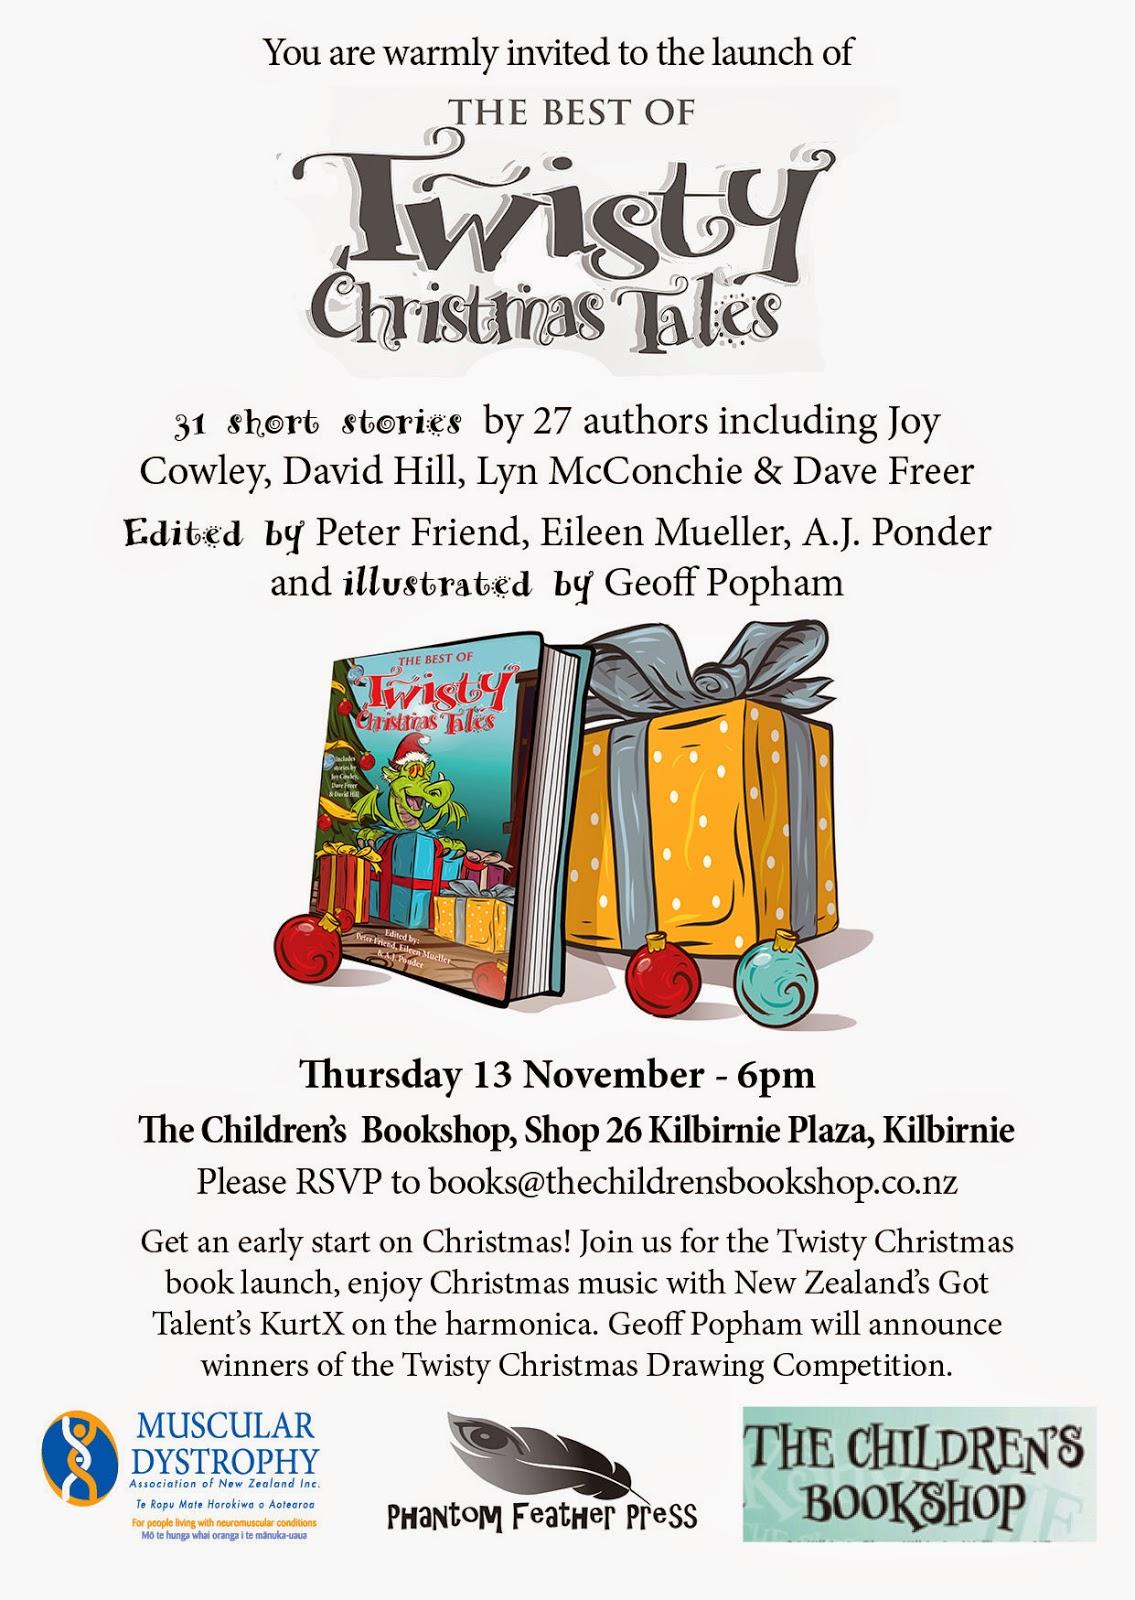 http://www.amazon.com/The-Best-Twisty-Christmas-Tales-ebook/dp/B00OWXKEAW